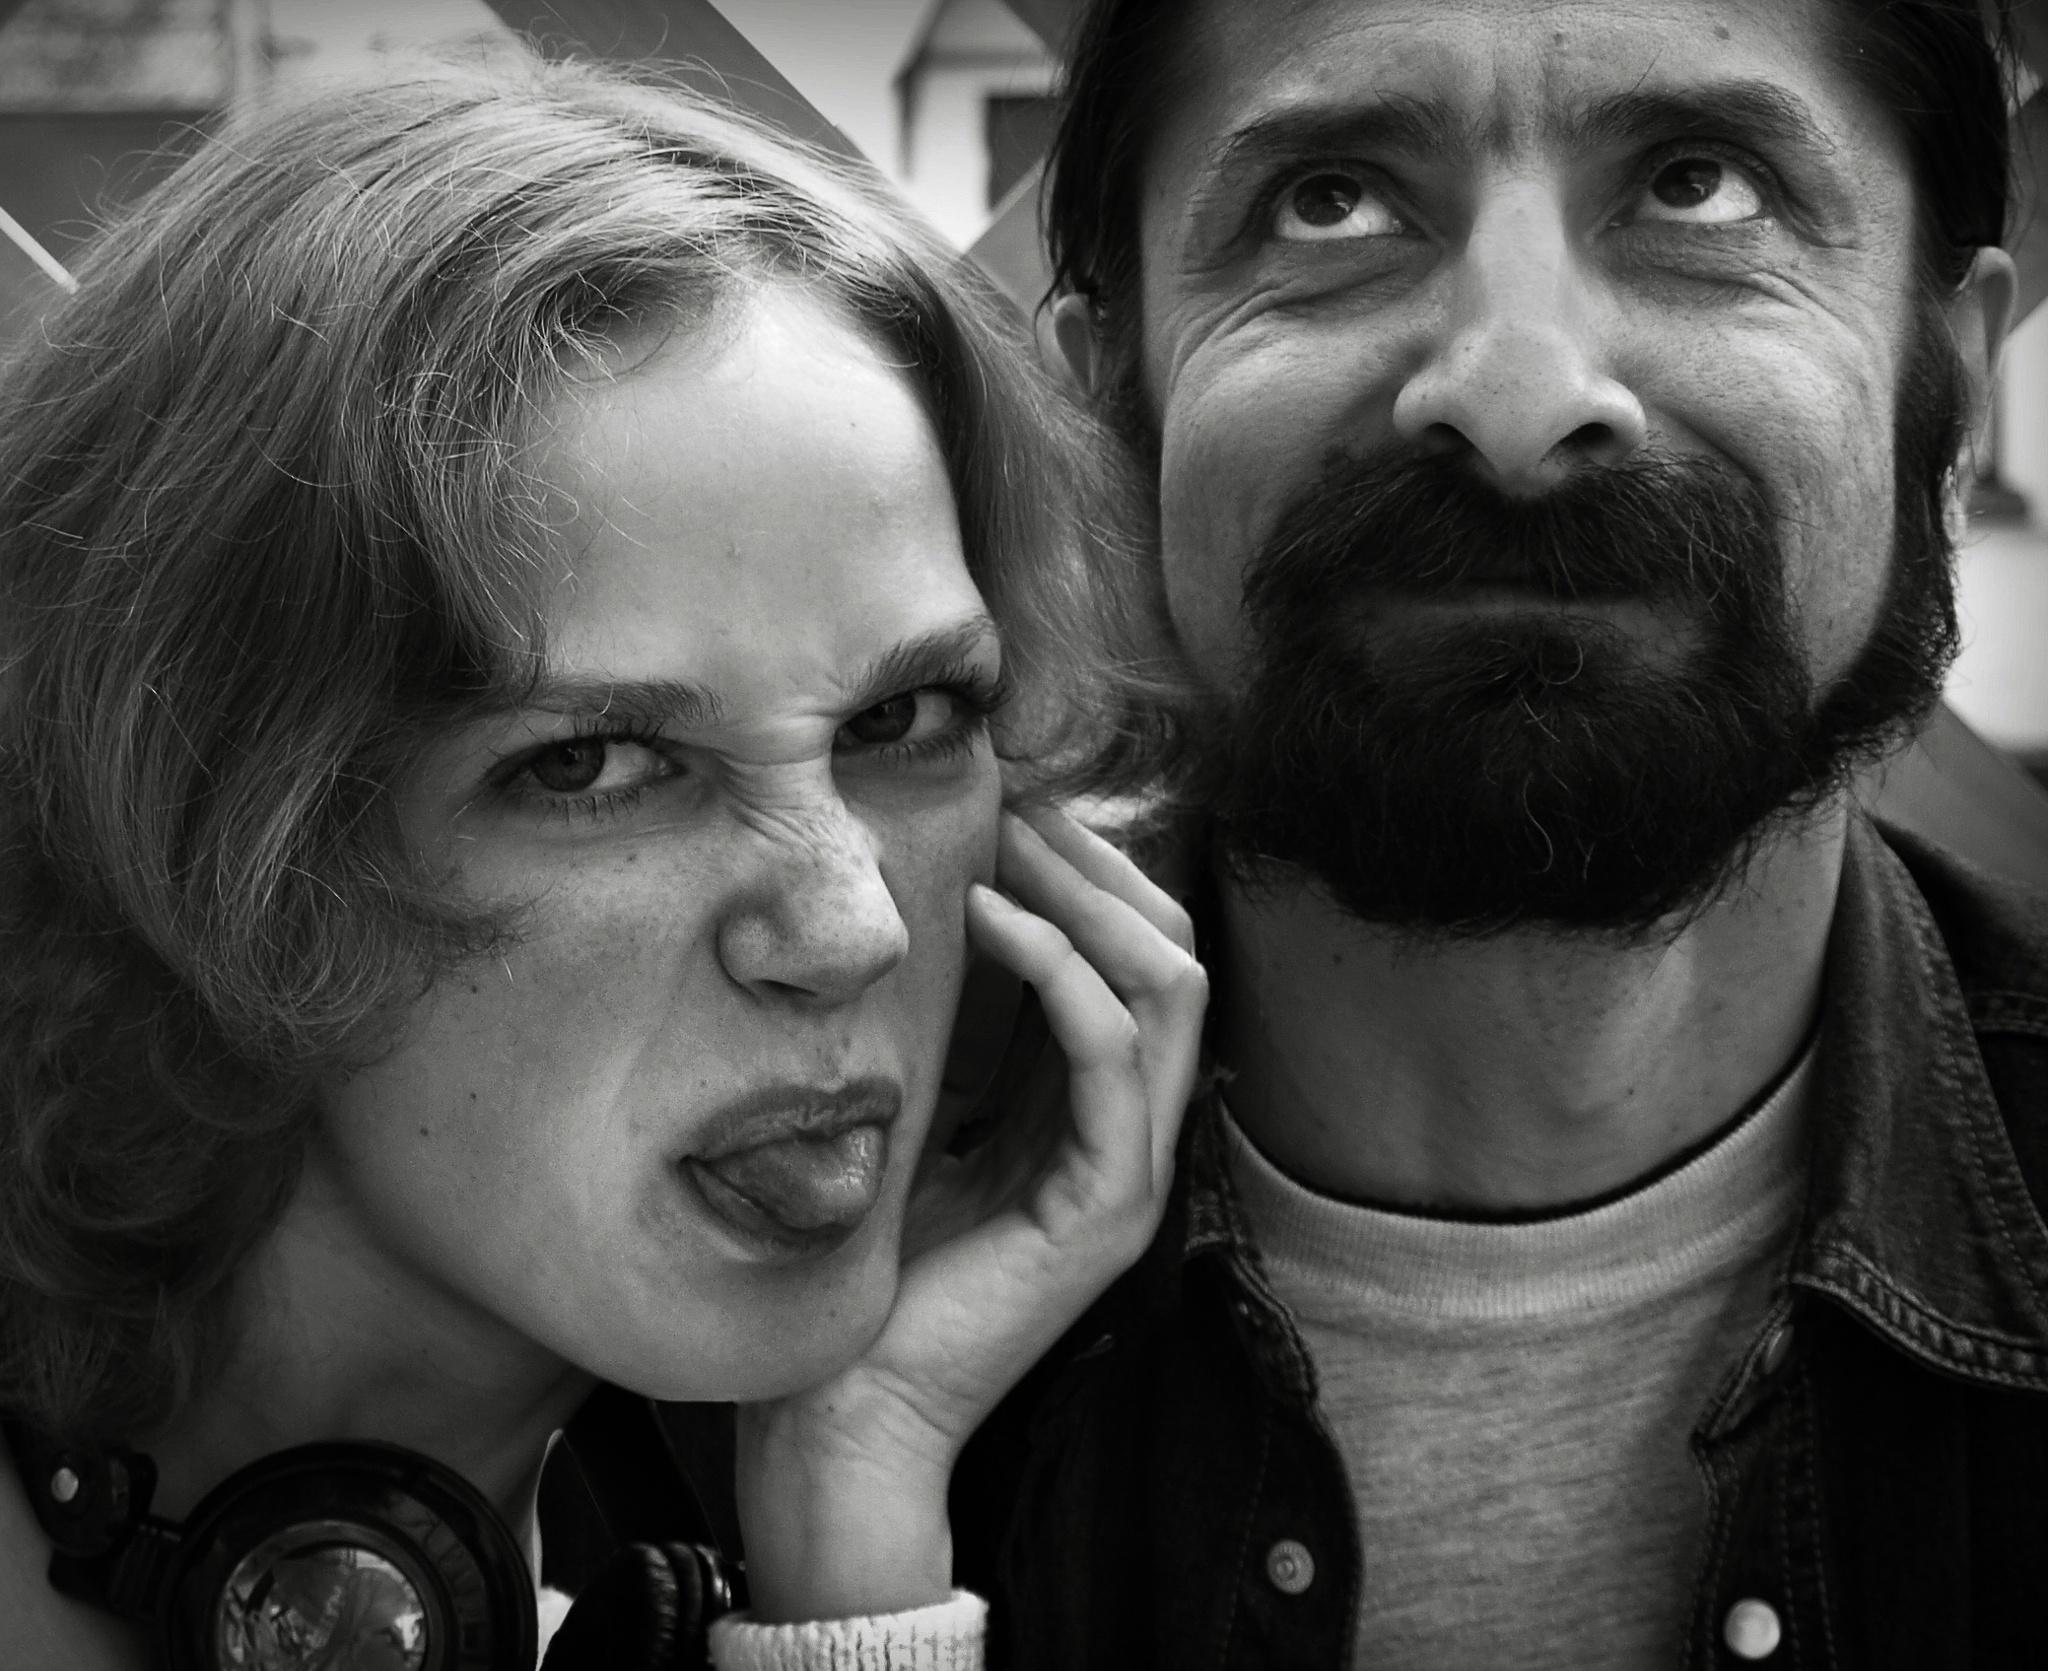 Sasha and Ahmed by Сергей Юрьев